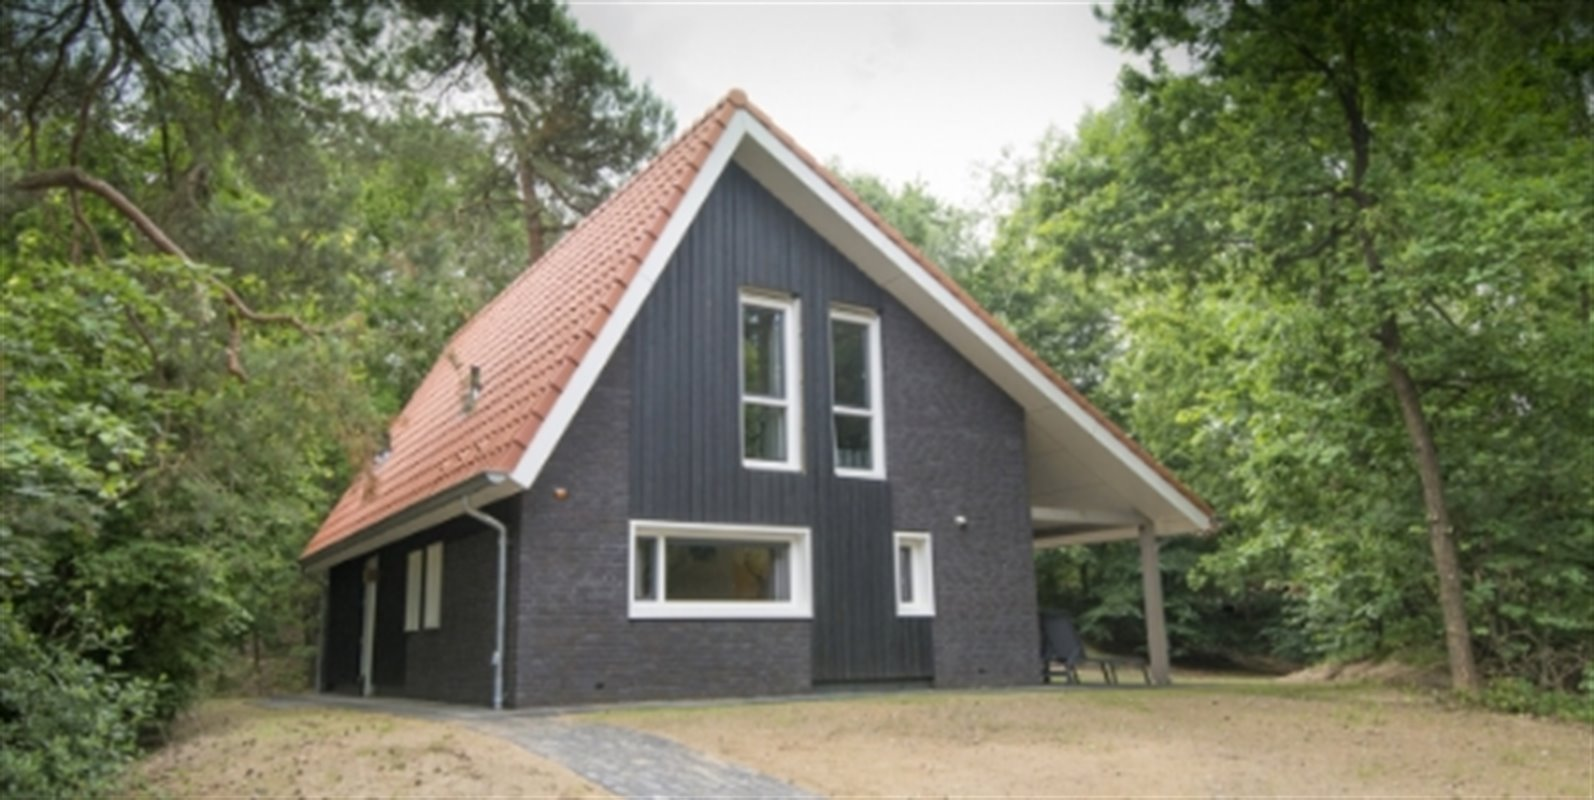 Landal Miggelenberg | 8-Pers.-Ferienhaus - Luxu...